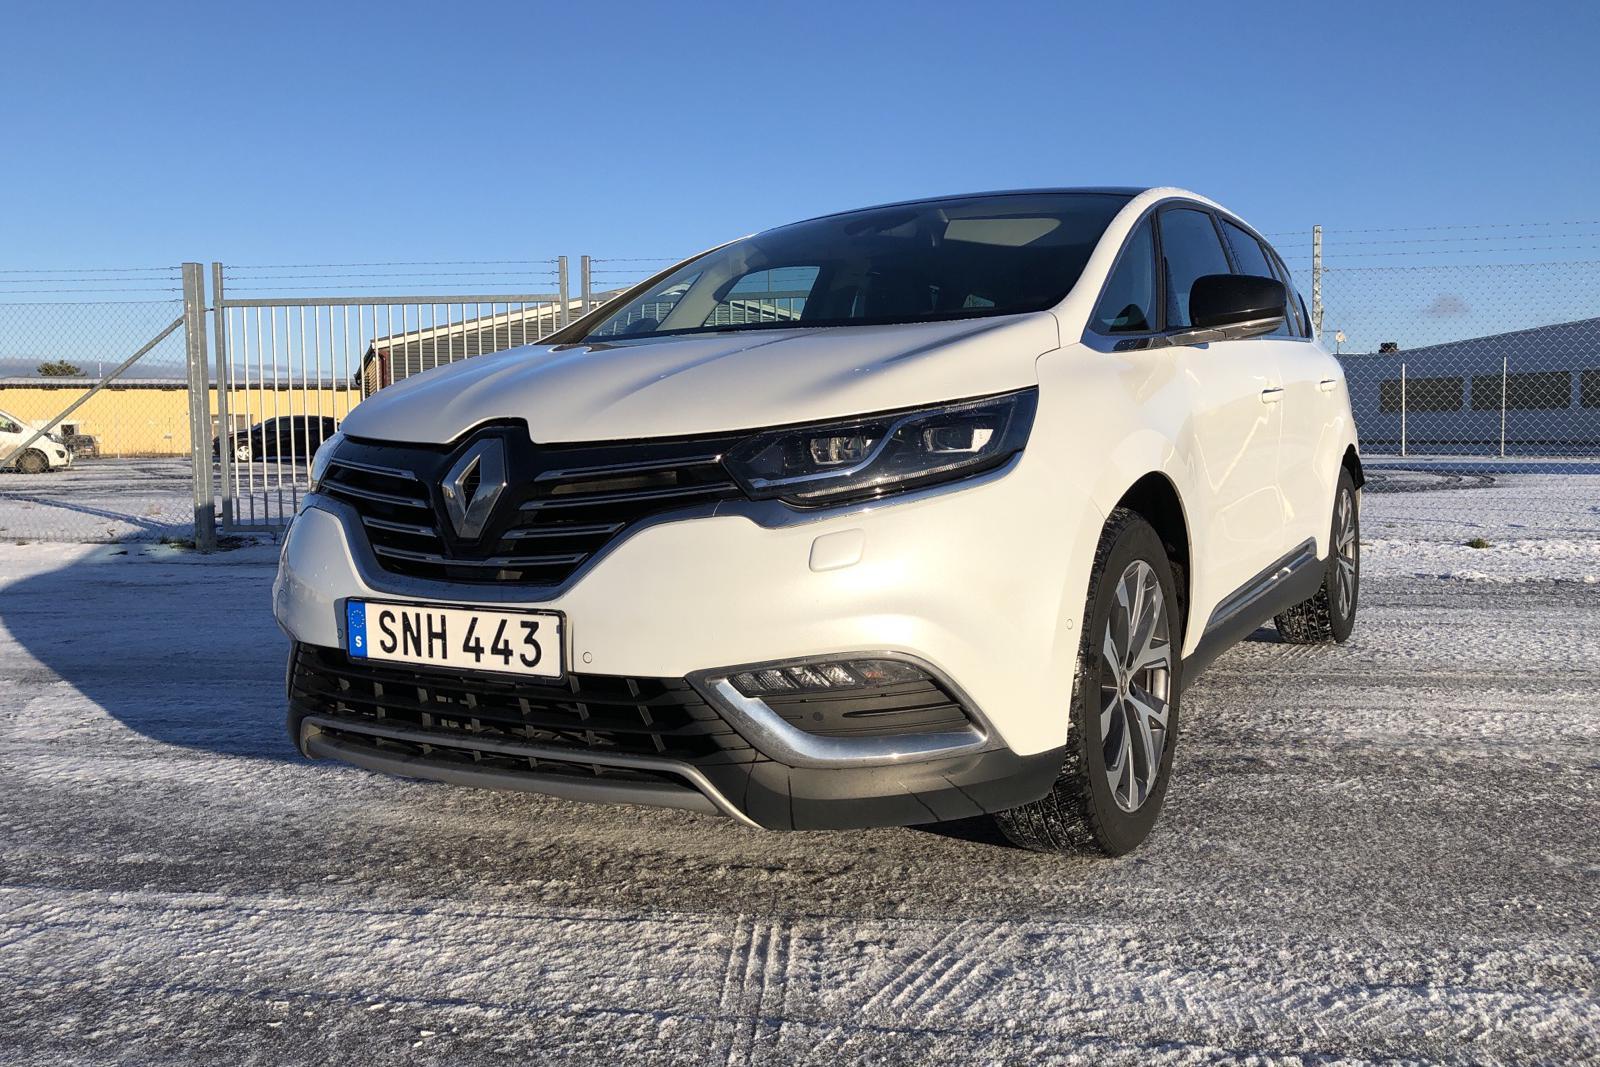 Renault Espace 1.6 dCi (160hk) - 151 700 km - Automatic - white - 2017